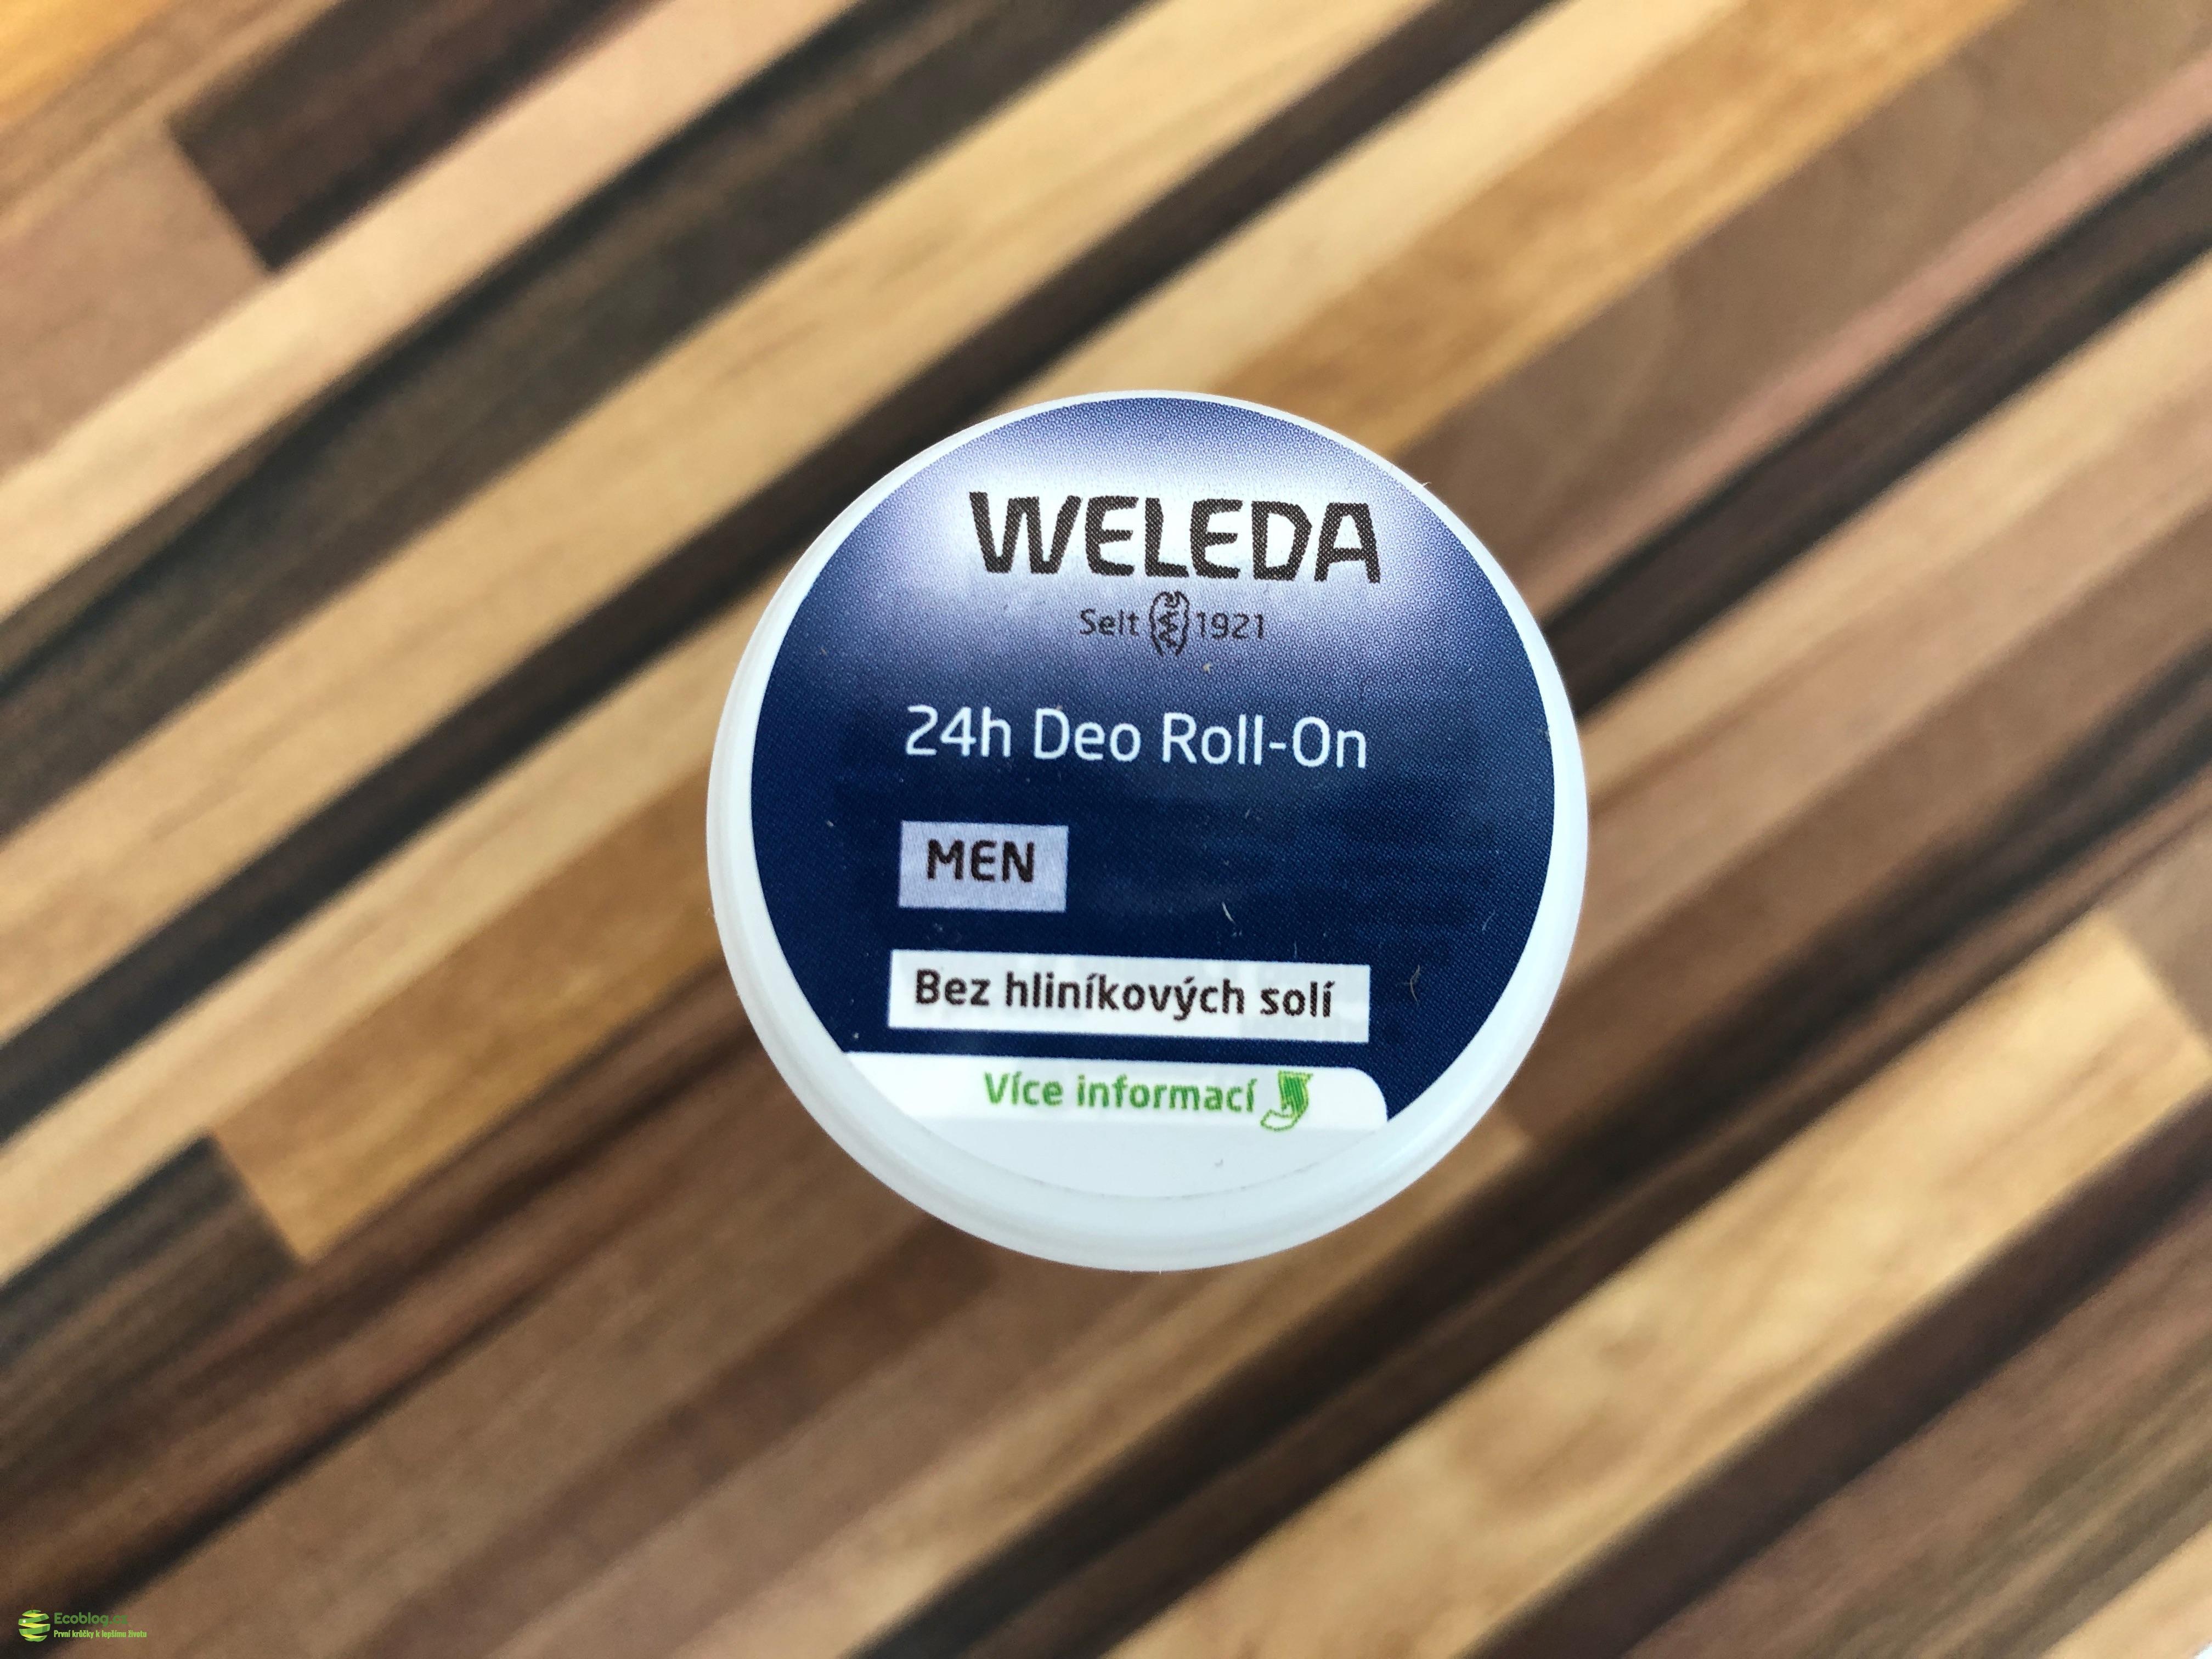 weleda deodorant